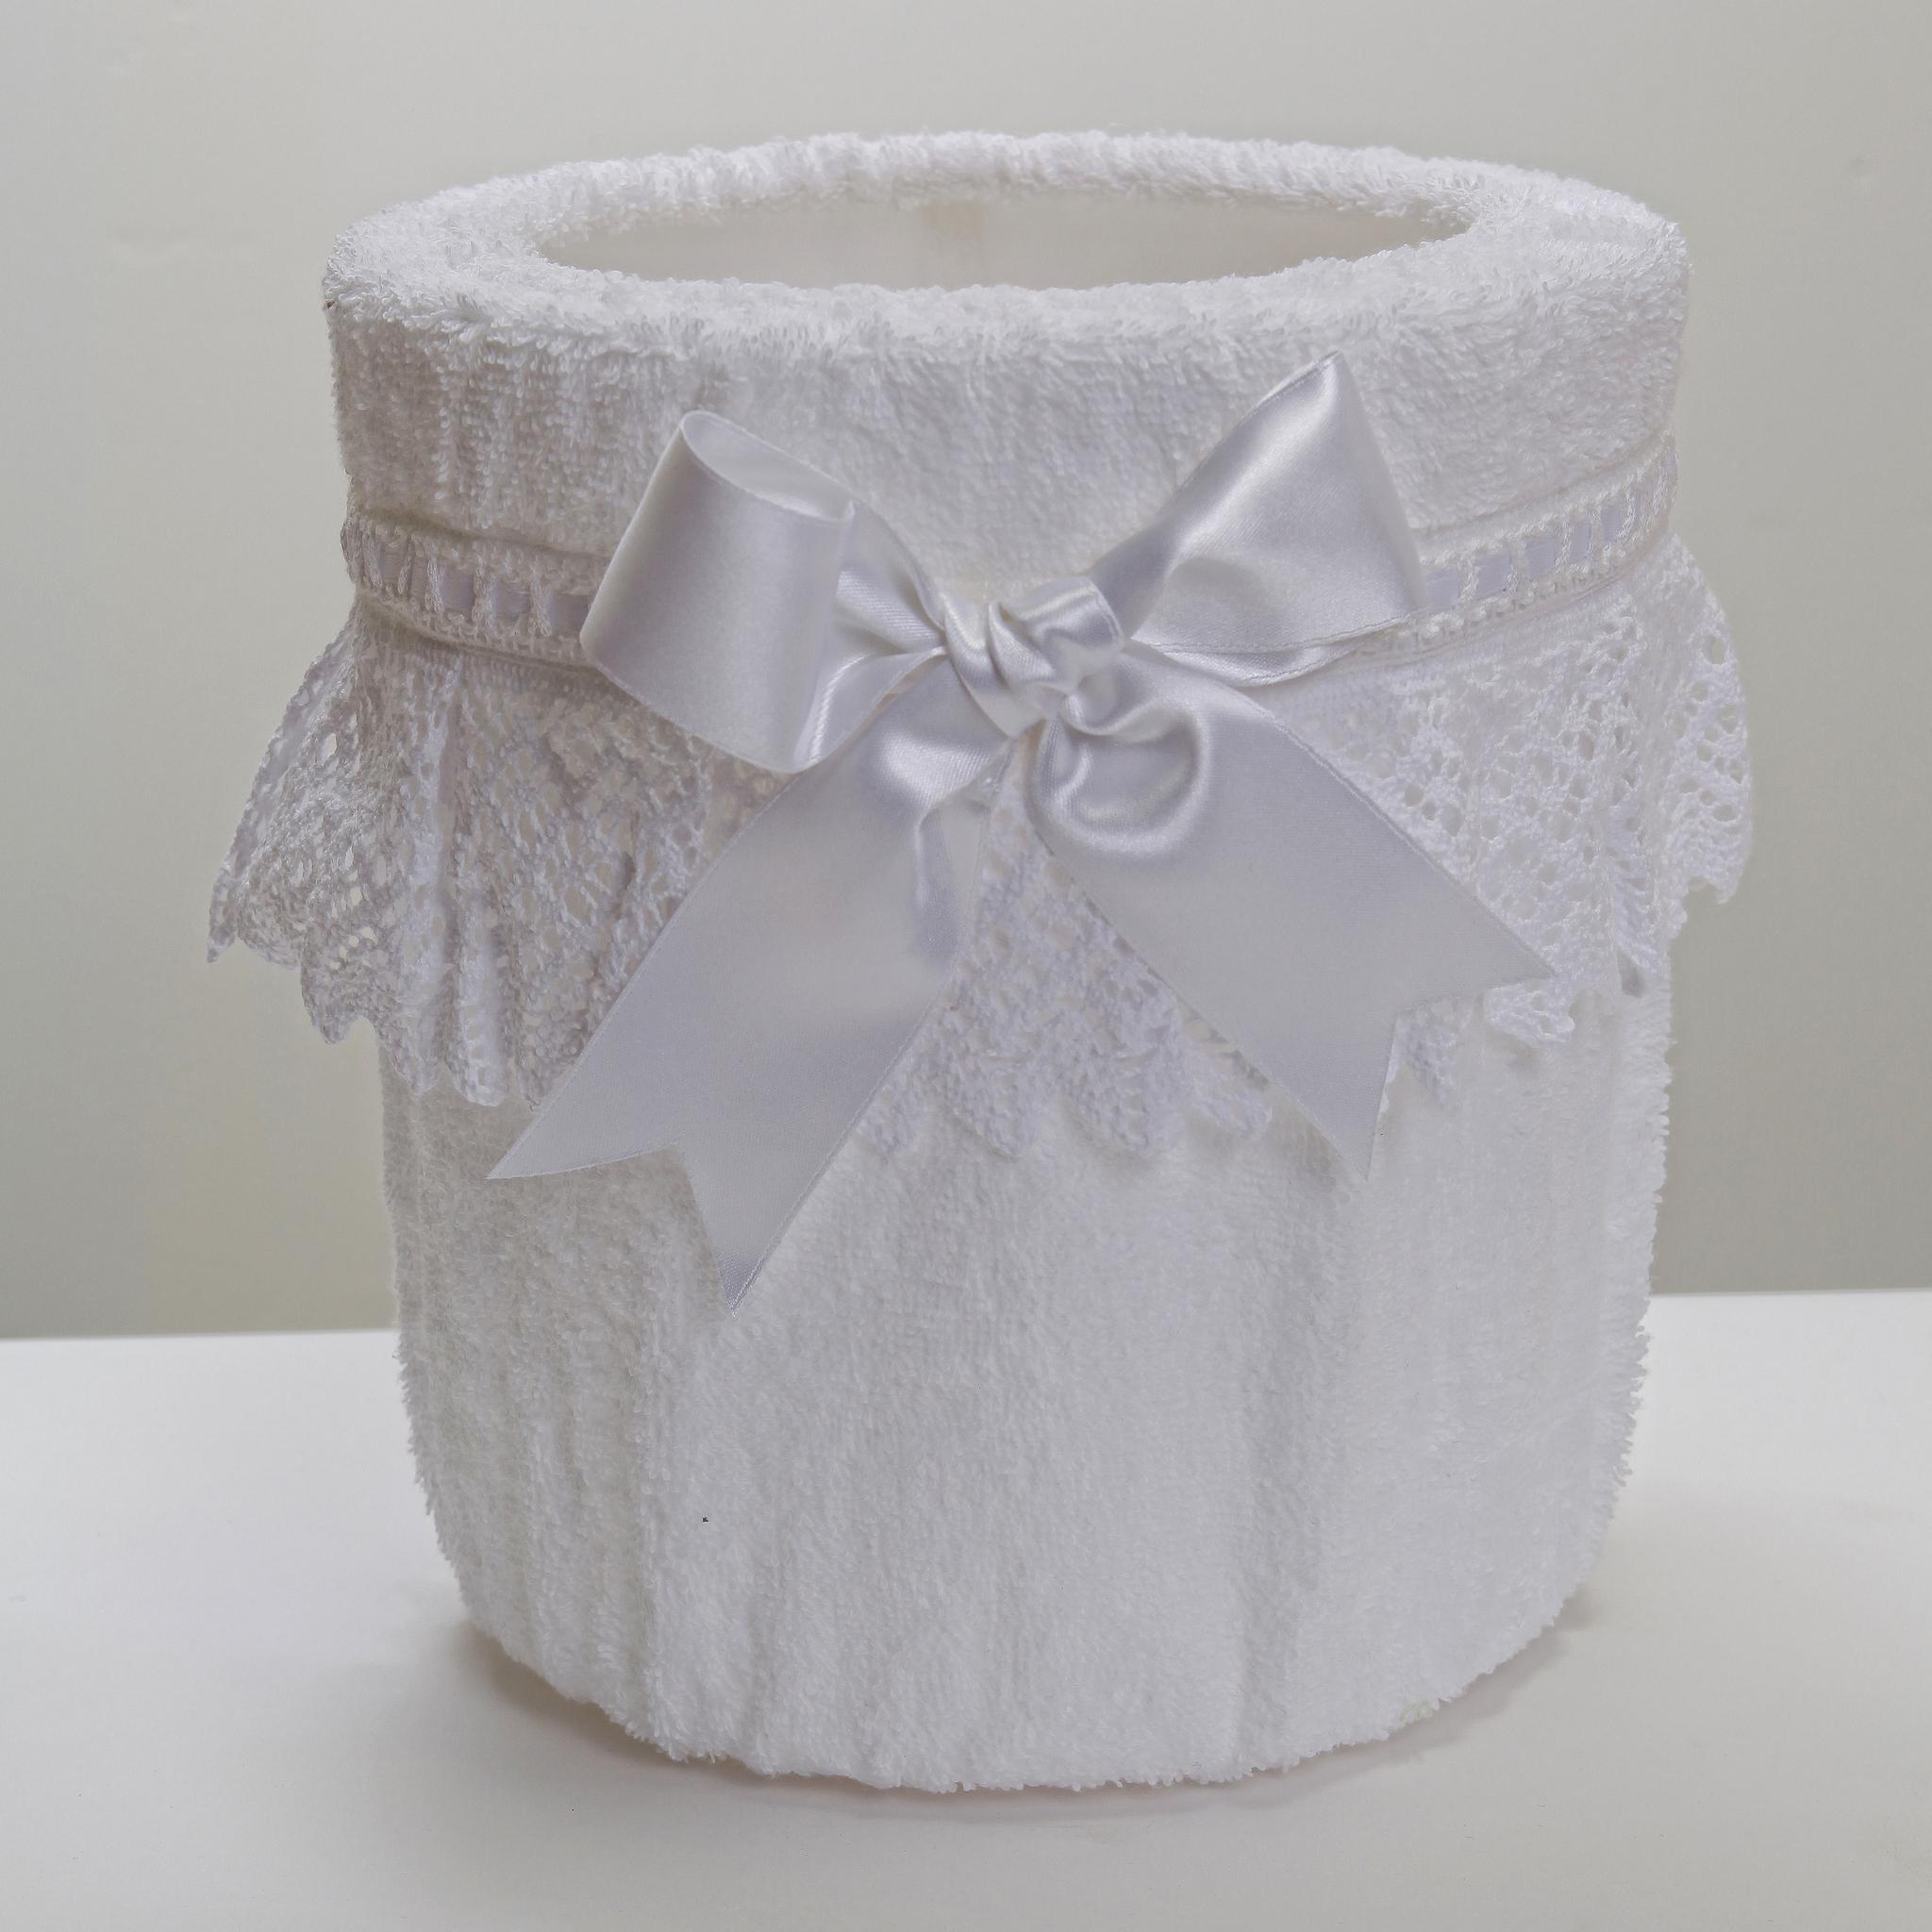 Ведра для мусора Ведро для мусора в ванную 20 Old Florence Rombetti белое vedro-dlya-musora-v-vannuyu-rombetti-ot-old-florence-italiya-belyy-tsvet.JPG